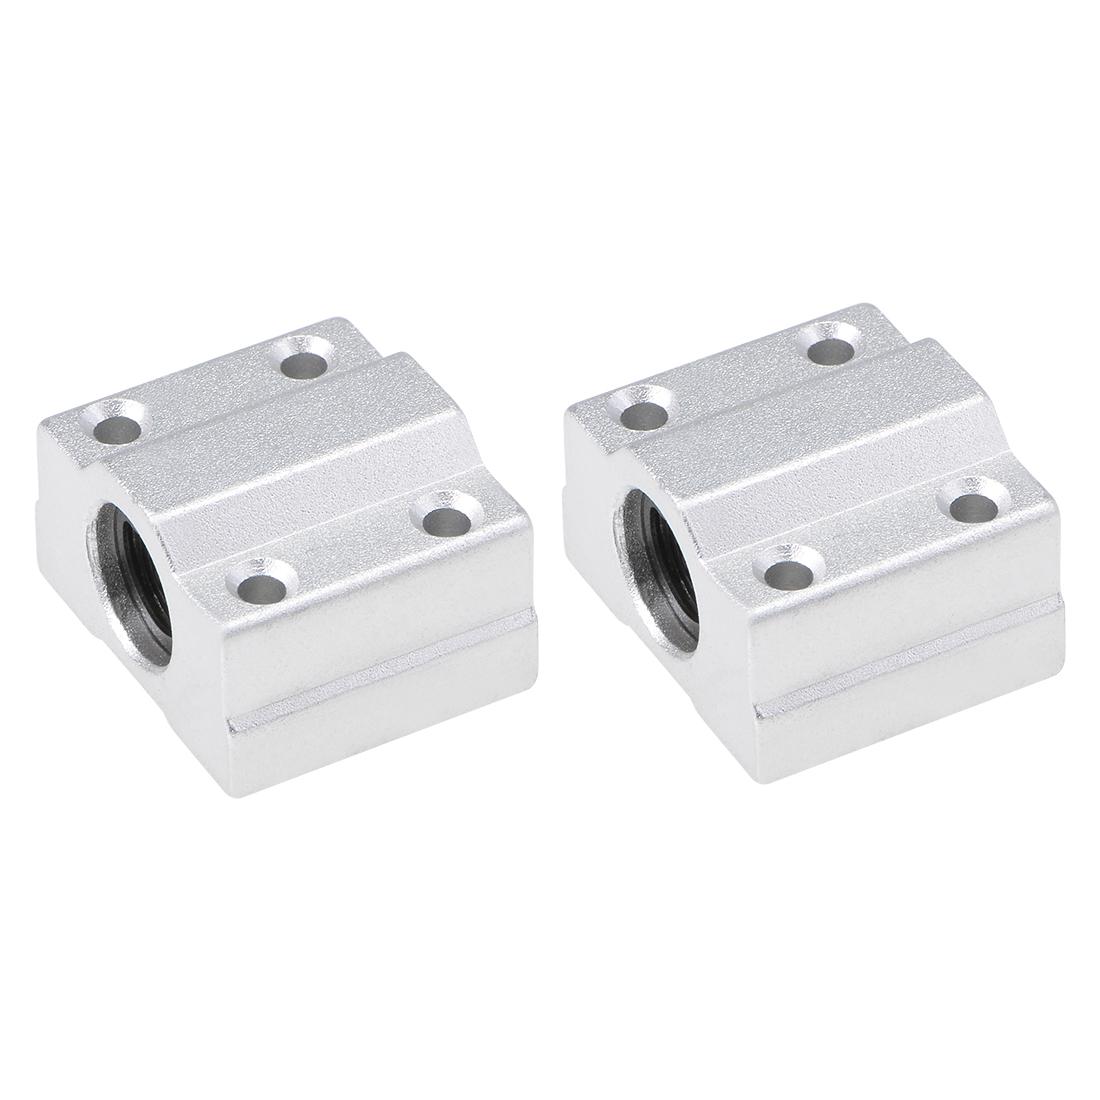 6mm Linear Ball Bearing SCS6UU Slide Block Units, 6mm Bore 2pcs